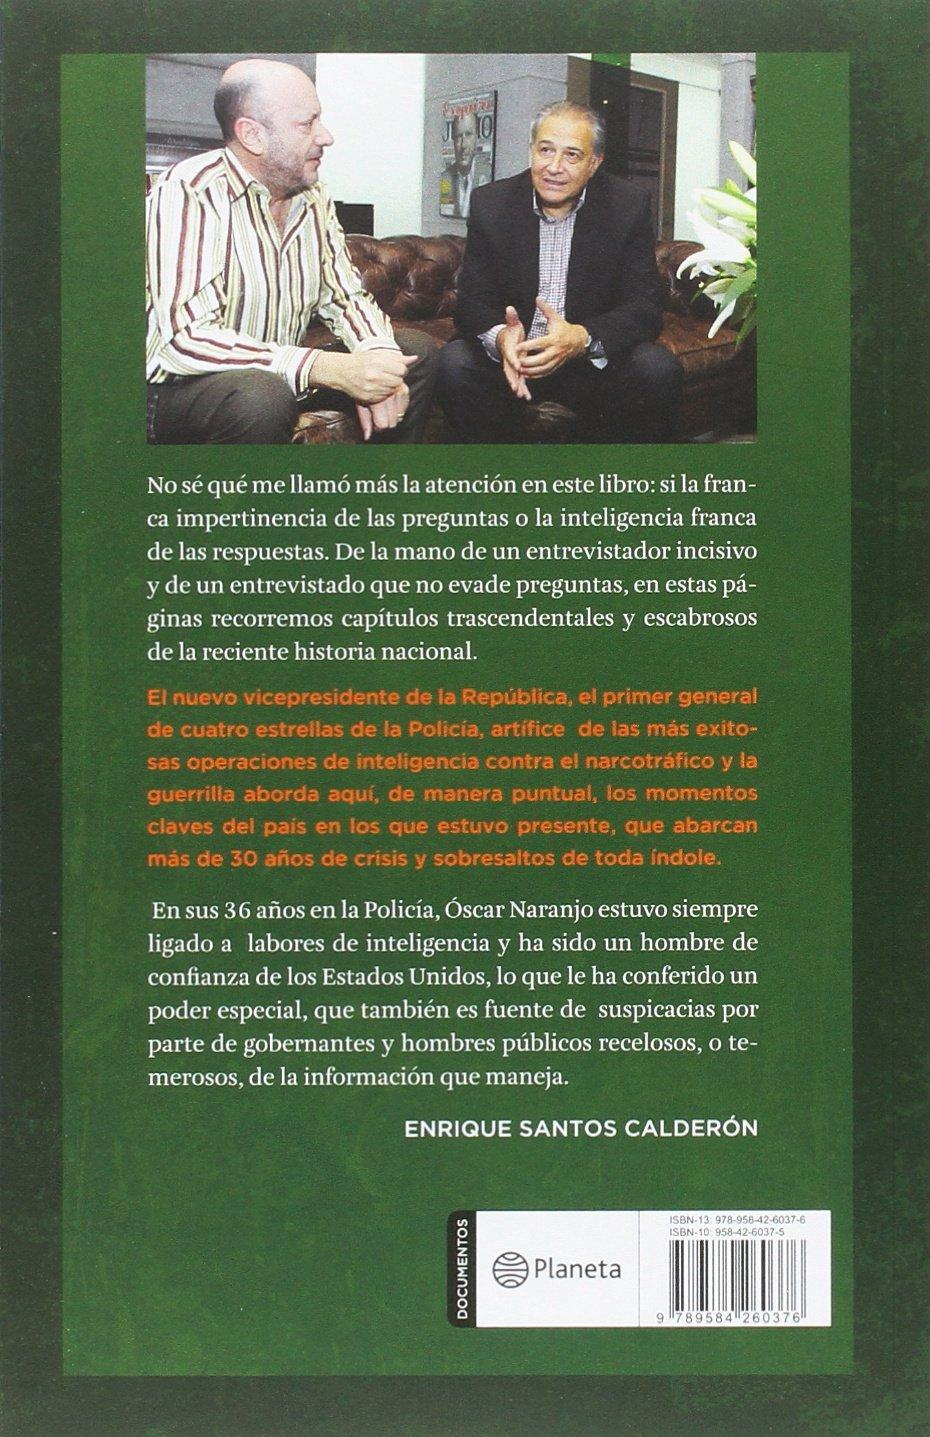 8b4e5694b3 Cazador de la mafia, El: Julio Sánchez Cristo: 9789584260376: Amazon.com:  Books